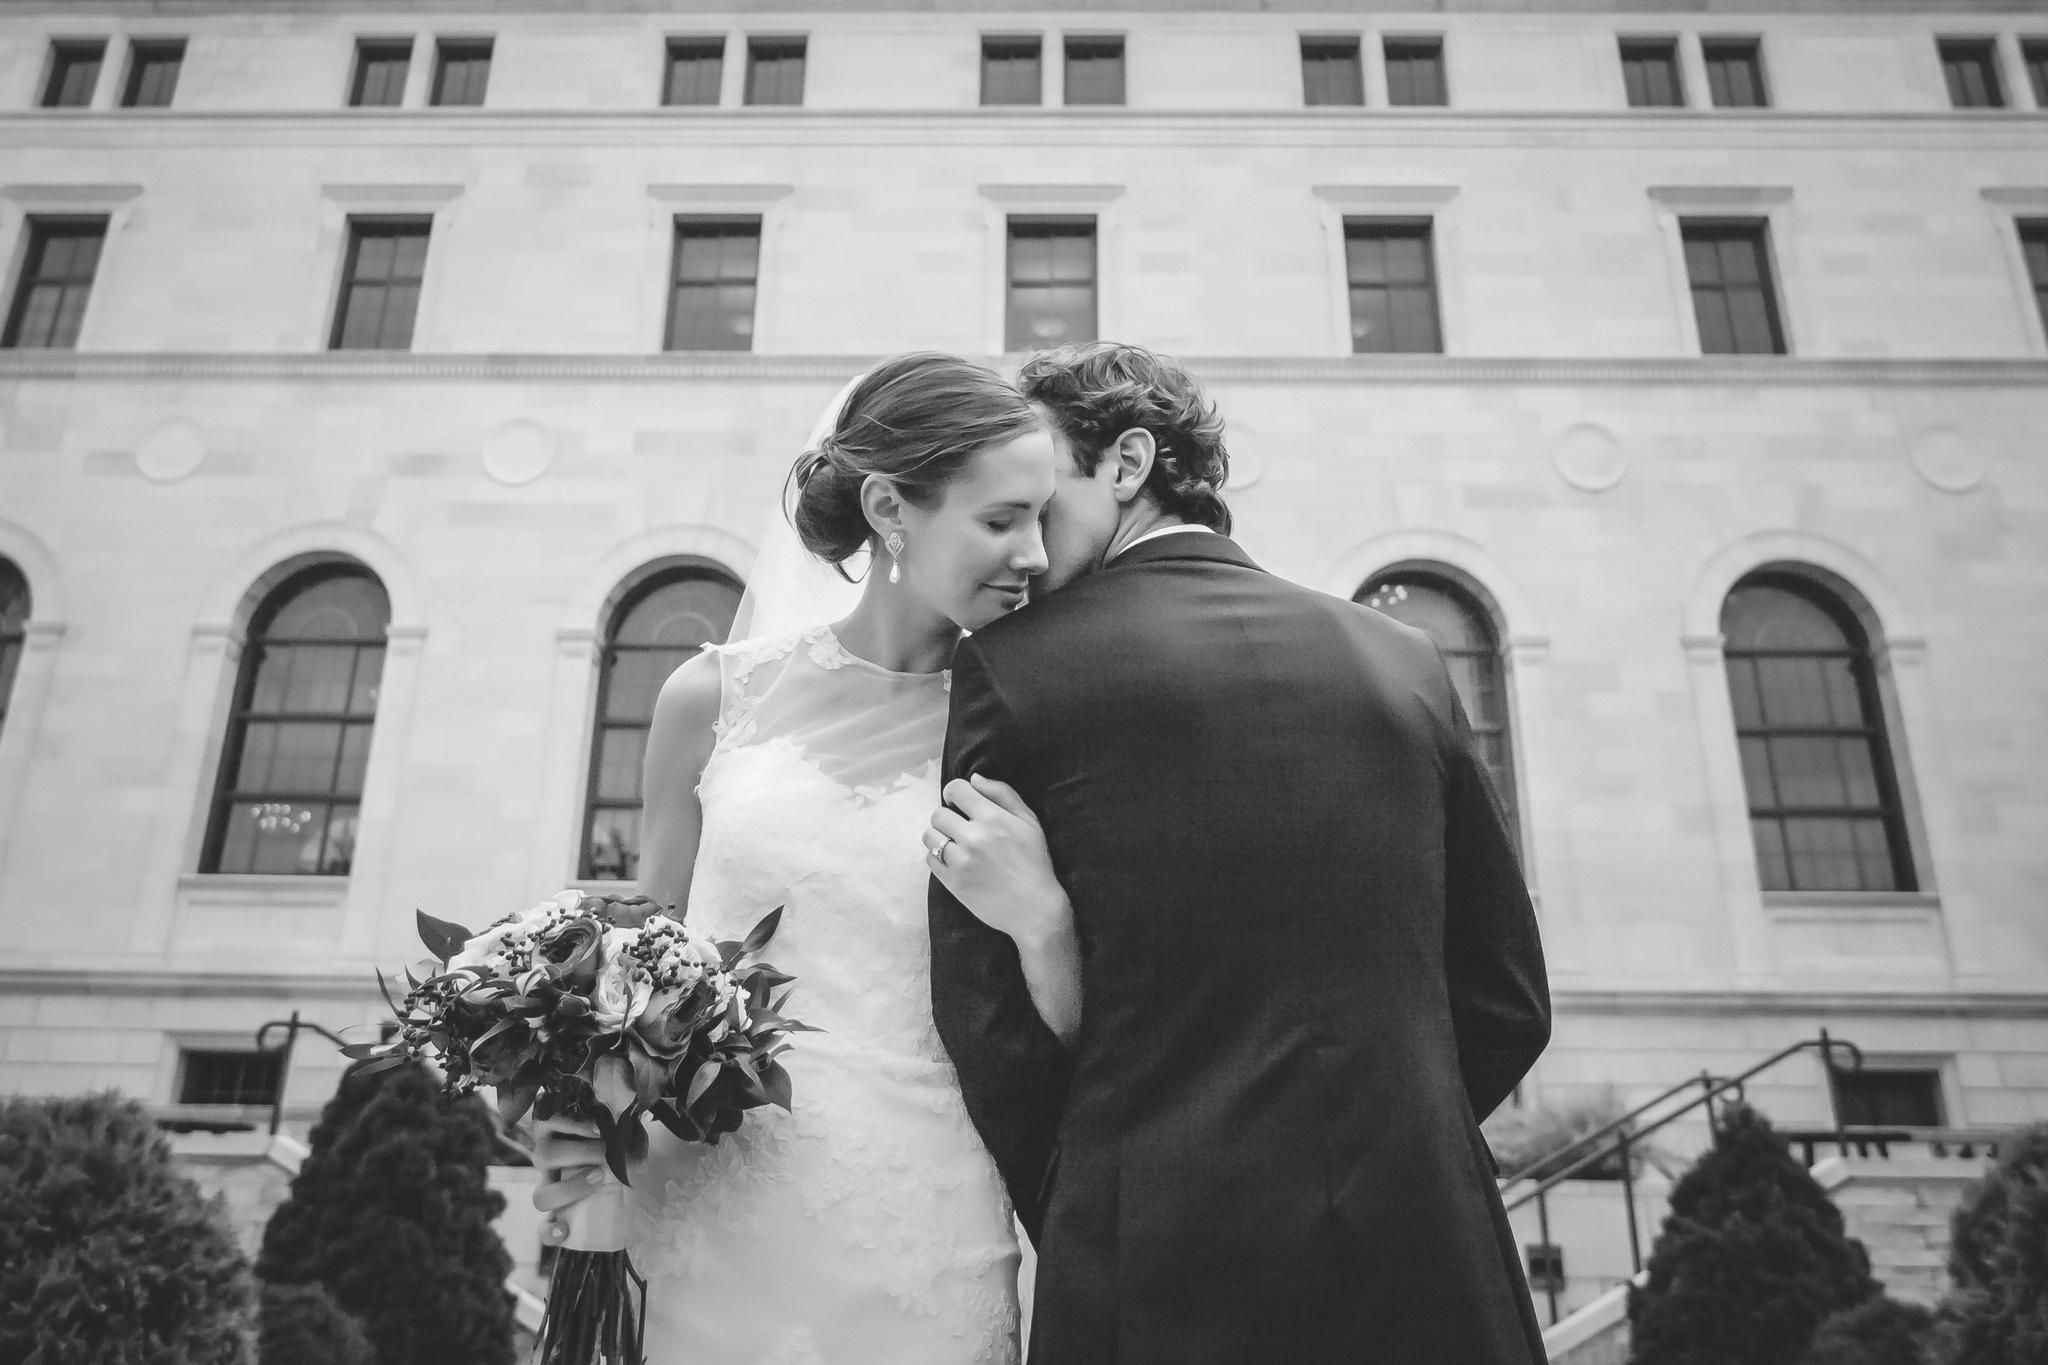 james j hill library wedding photography-21.jpg